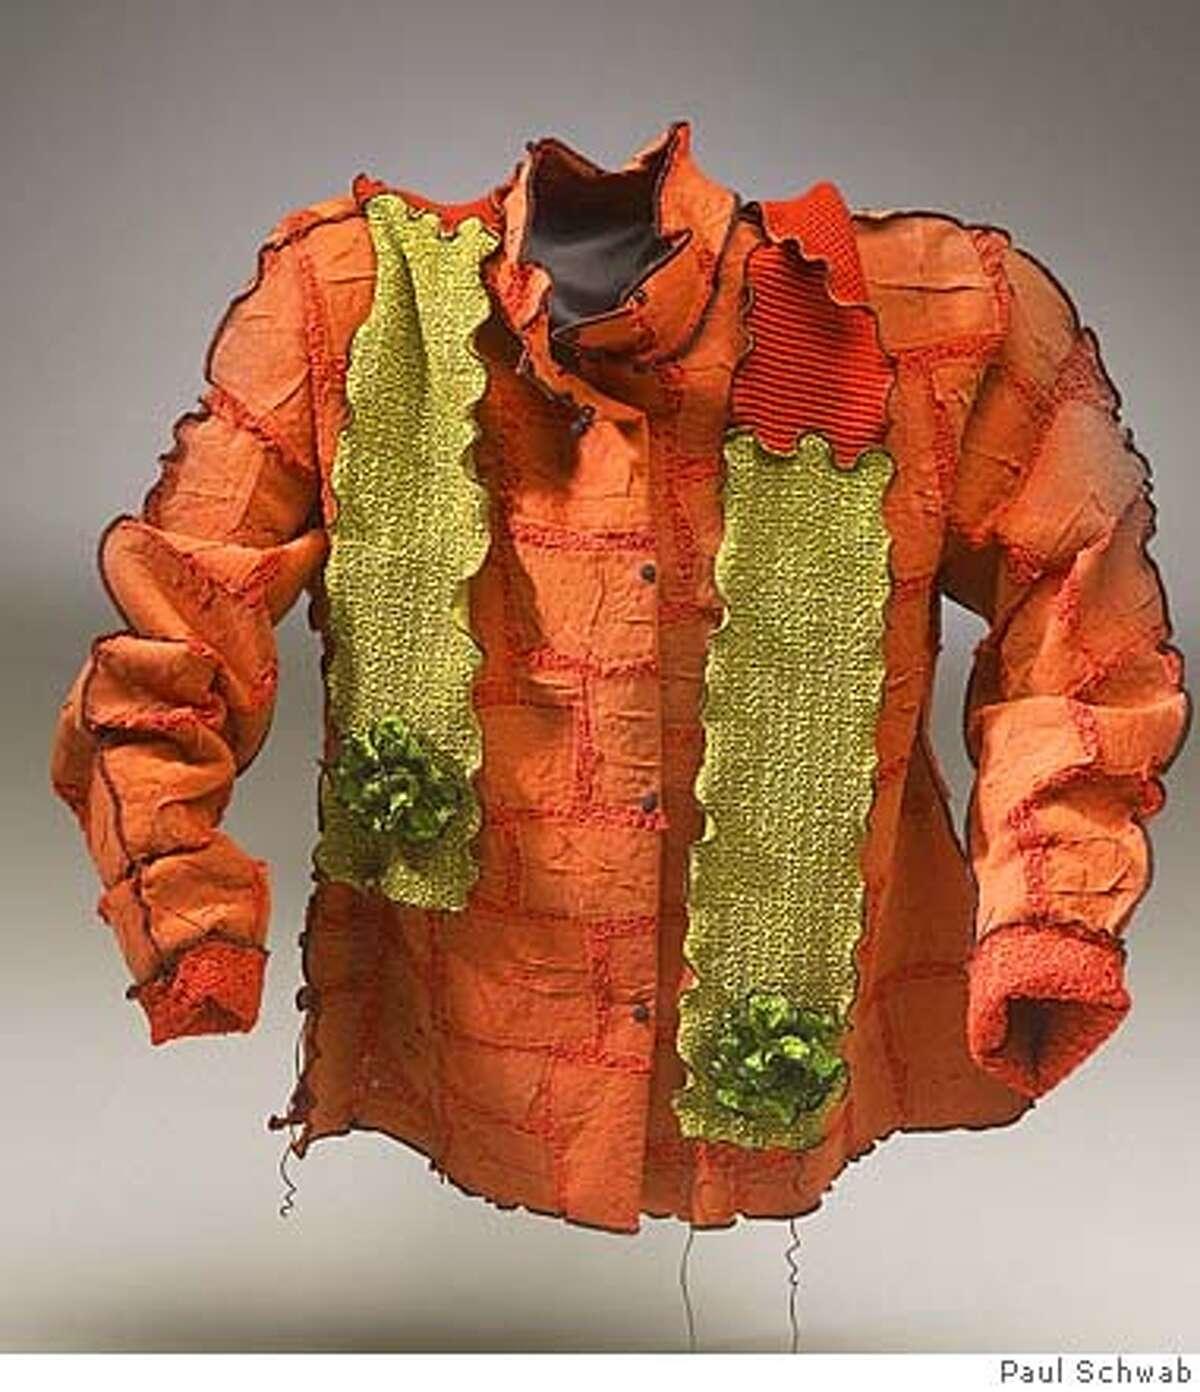 Slug: Stylematters18. I Silk shirt and silk scarf. Shirt = $425 Scarf = $105, by Deborah Cross. Photographer: Paul Schwab. Courtesy: Artwear in the Galleries. Ran on: 11-18-2007 Erin Fetherston ivory dress, $44.99, and heart bag, $29.99.